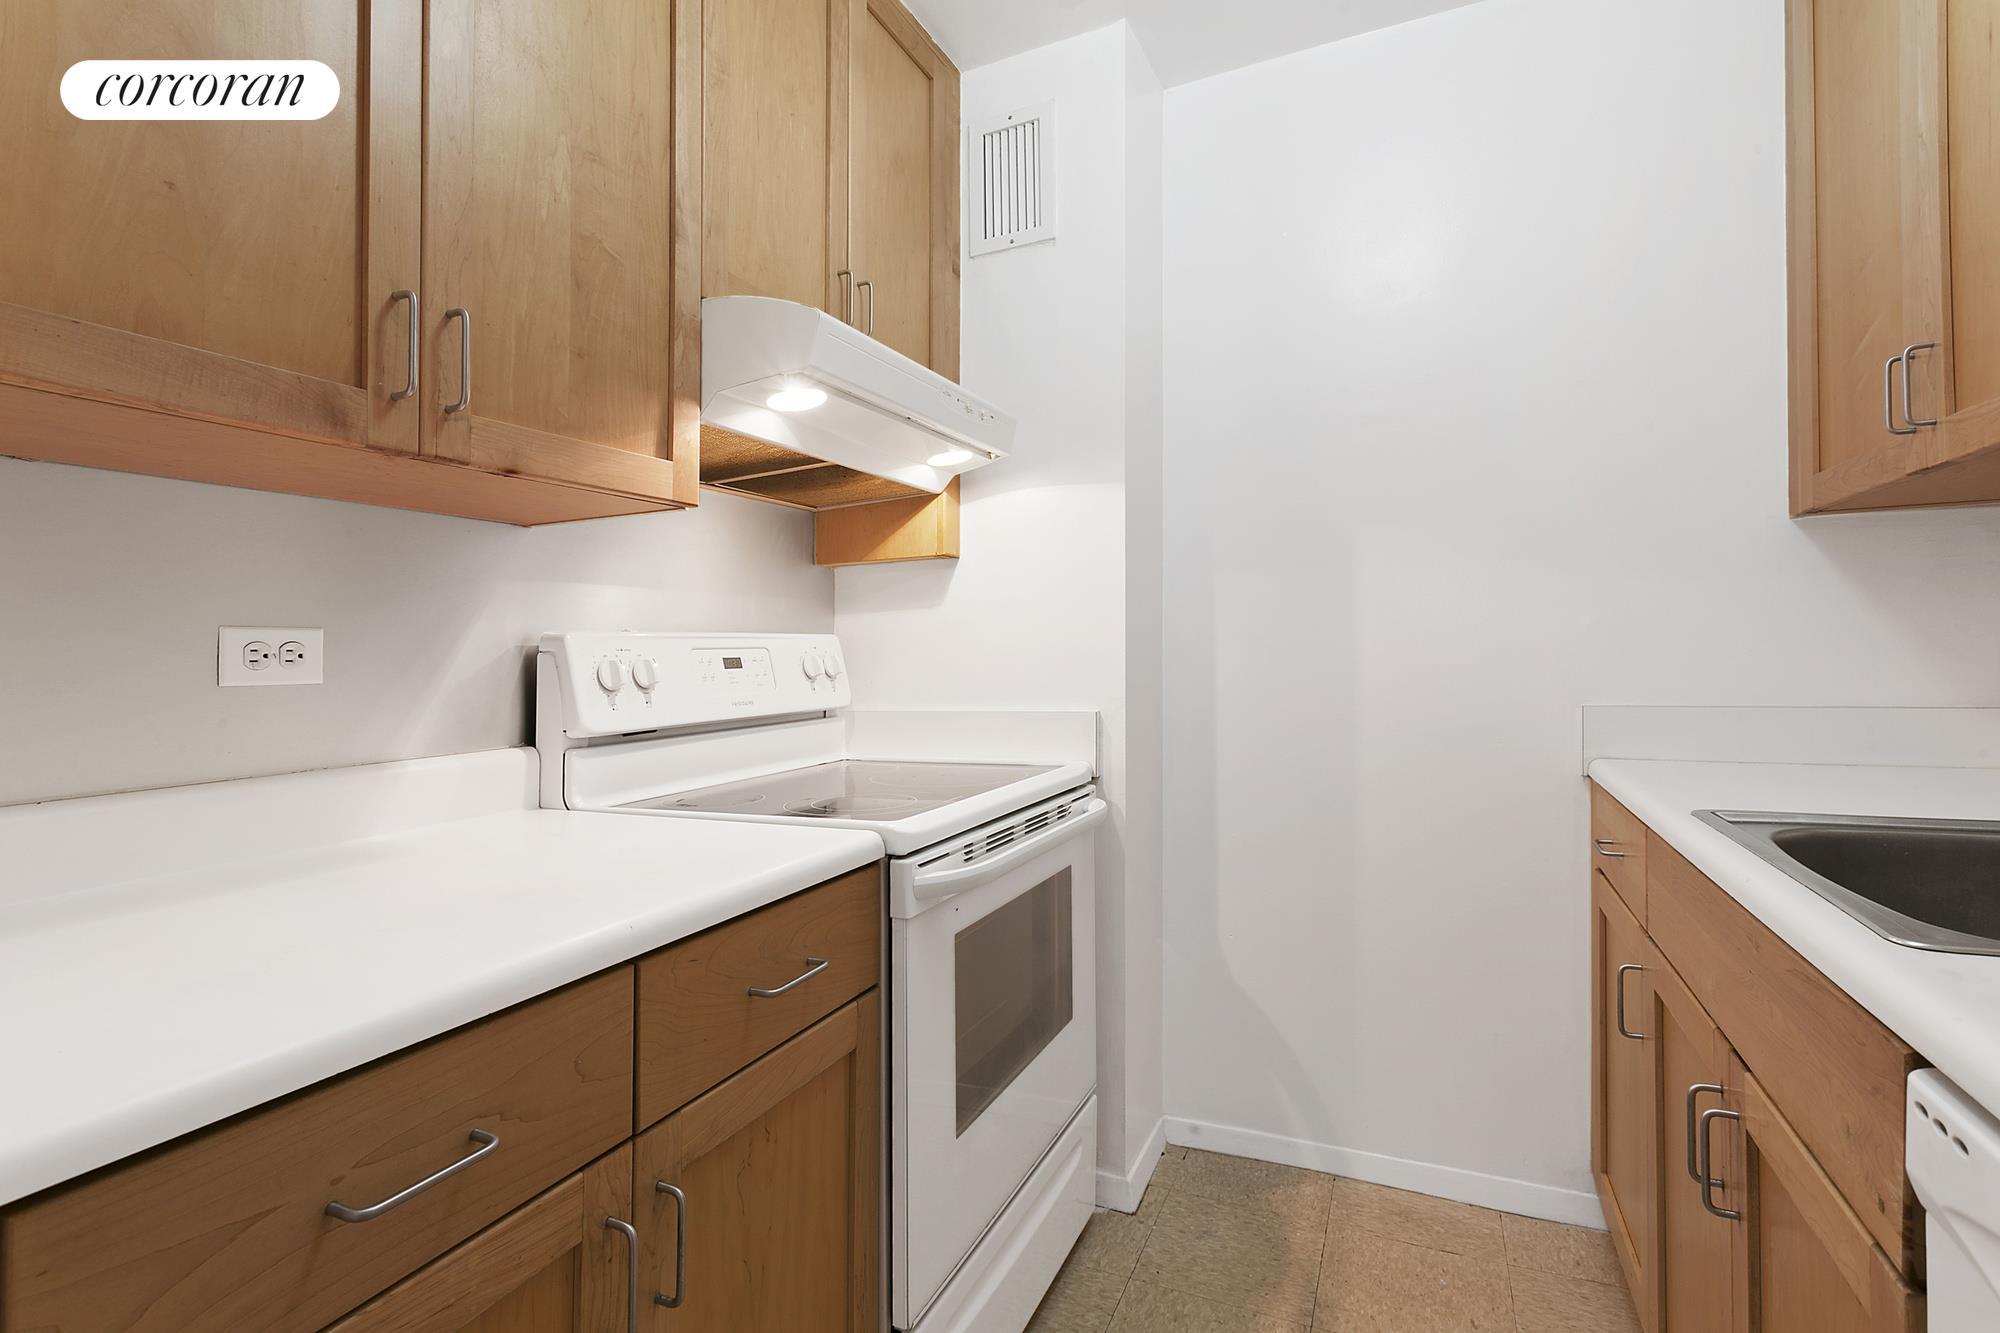 Corcoran, 137 Barrow Street, Apt. 4A, West Village Real Estate ...